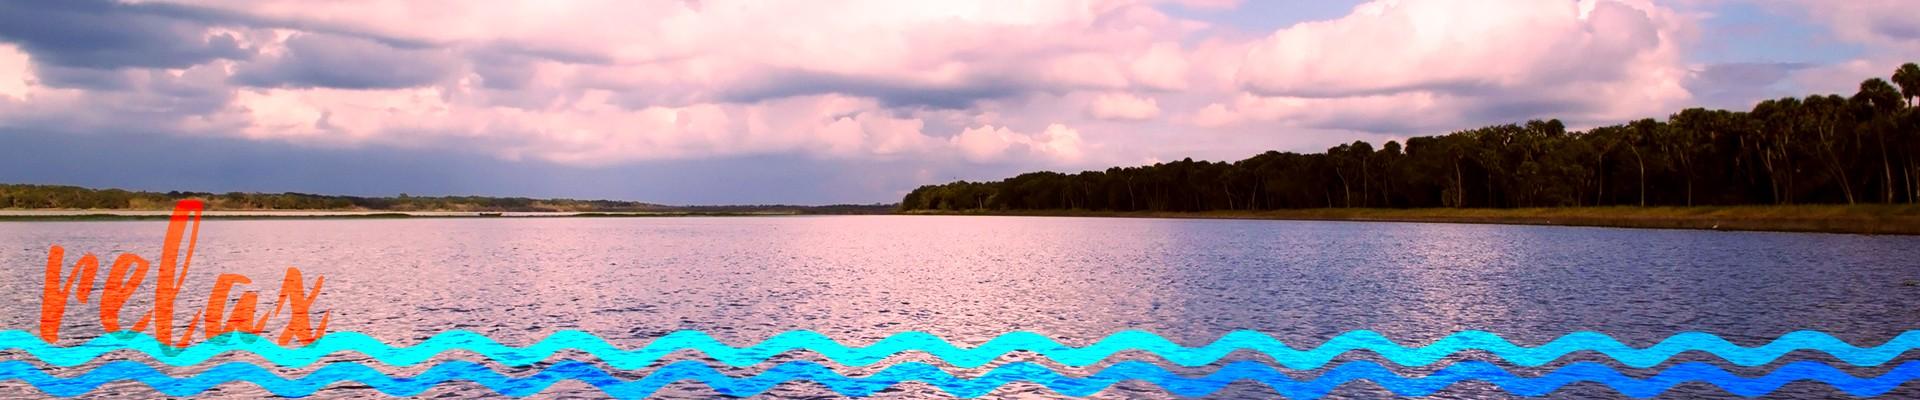 relax - Myakka River State Park